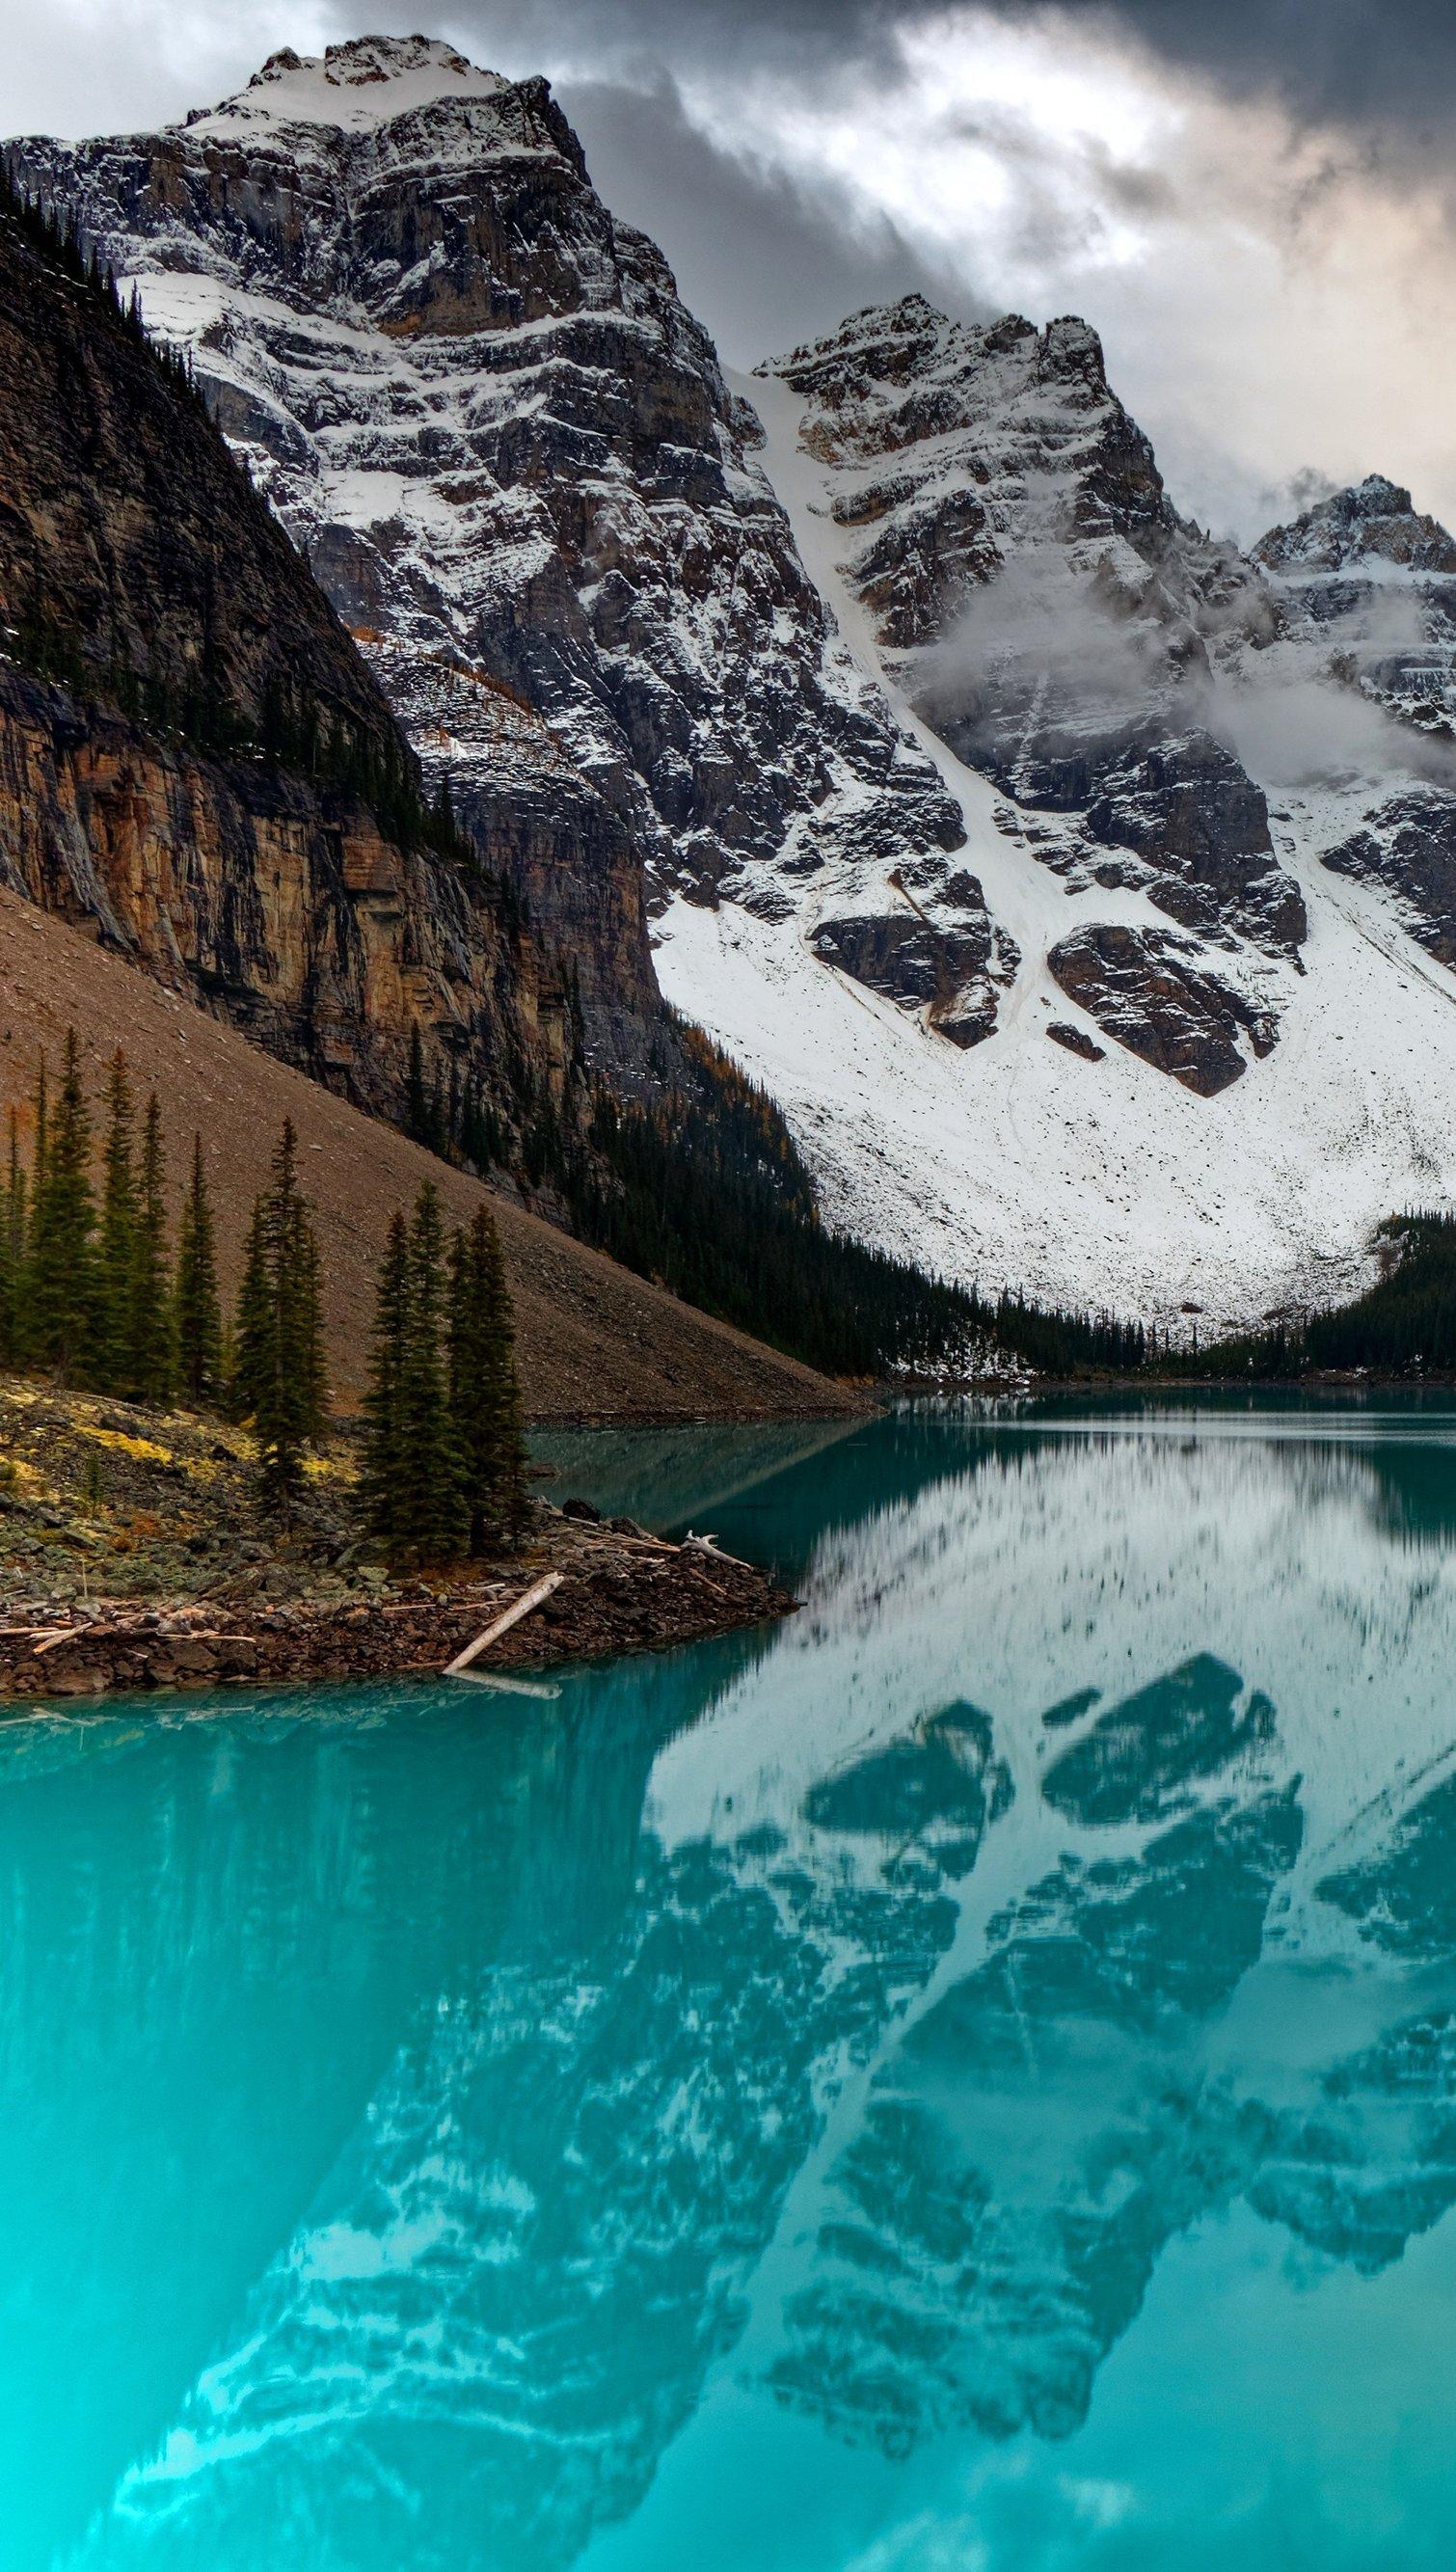 Wallpaper Moraine Canada Vertical